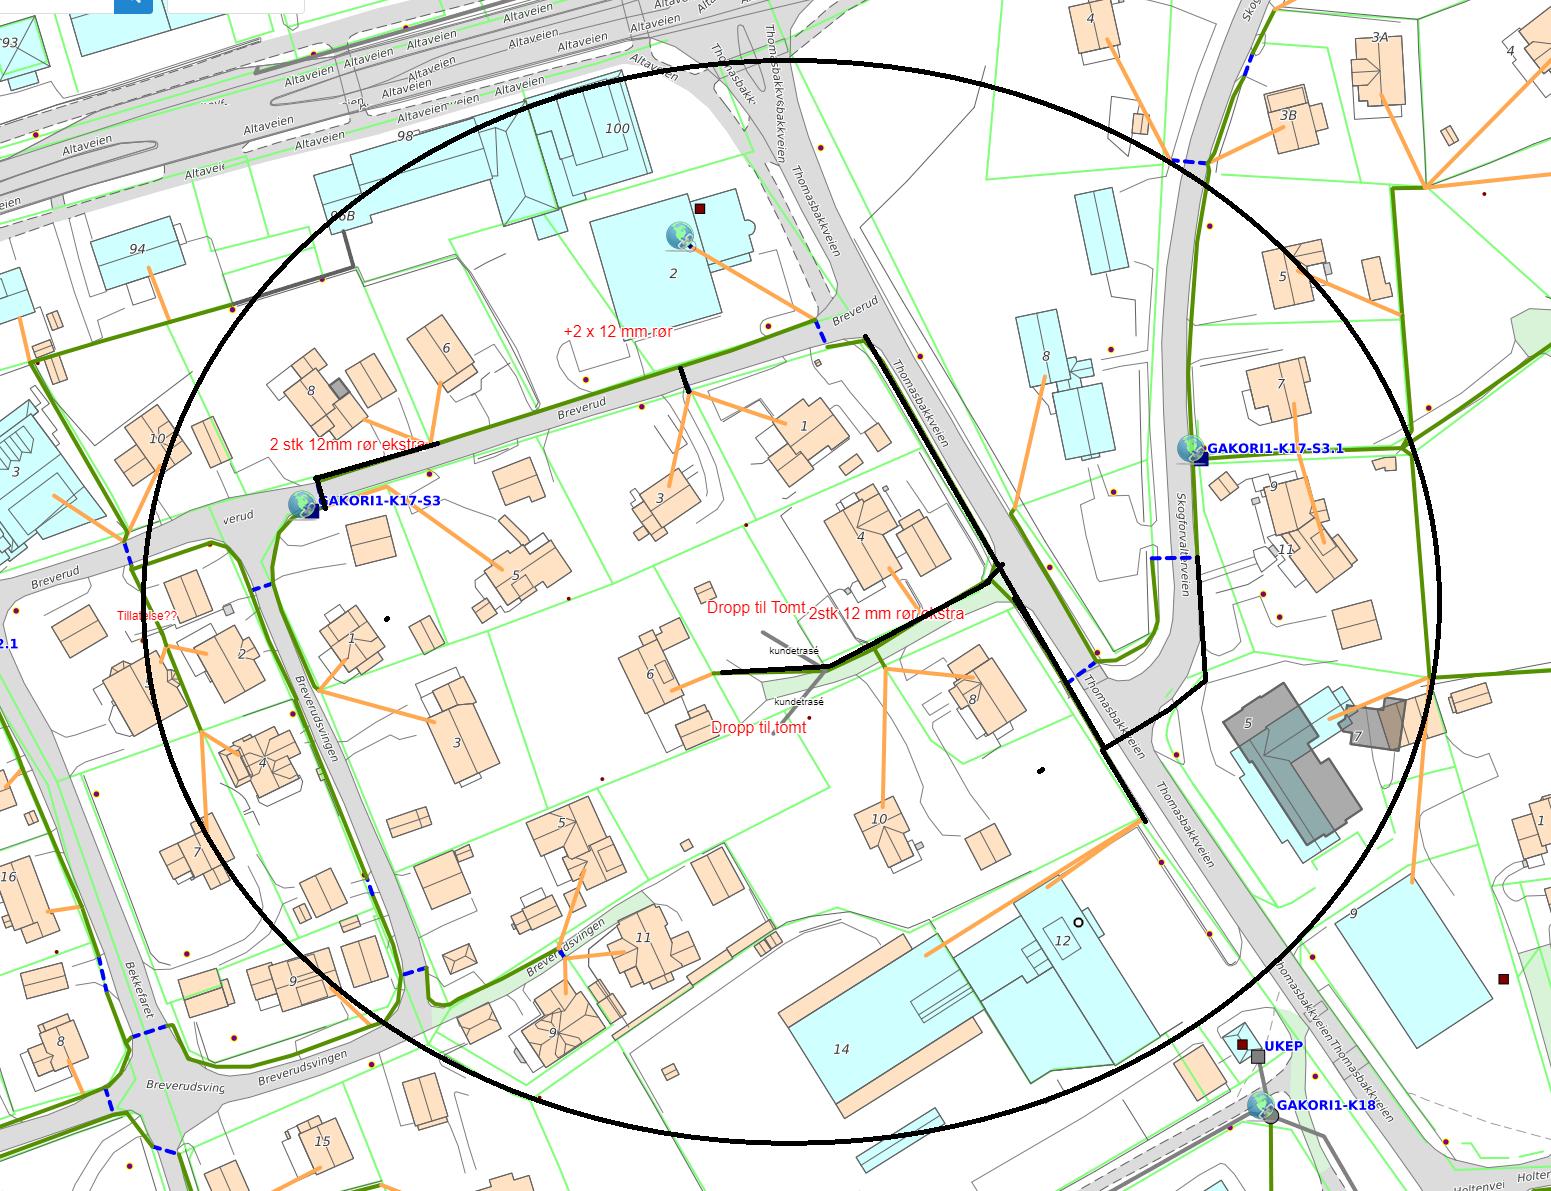 Kartskisse som viser gravearbeider i Bossekop i forbindelse med Signal og Altibox fiberutbyggingsprosjekt i Bossekop Sør og Alta